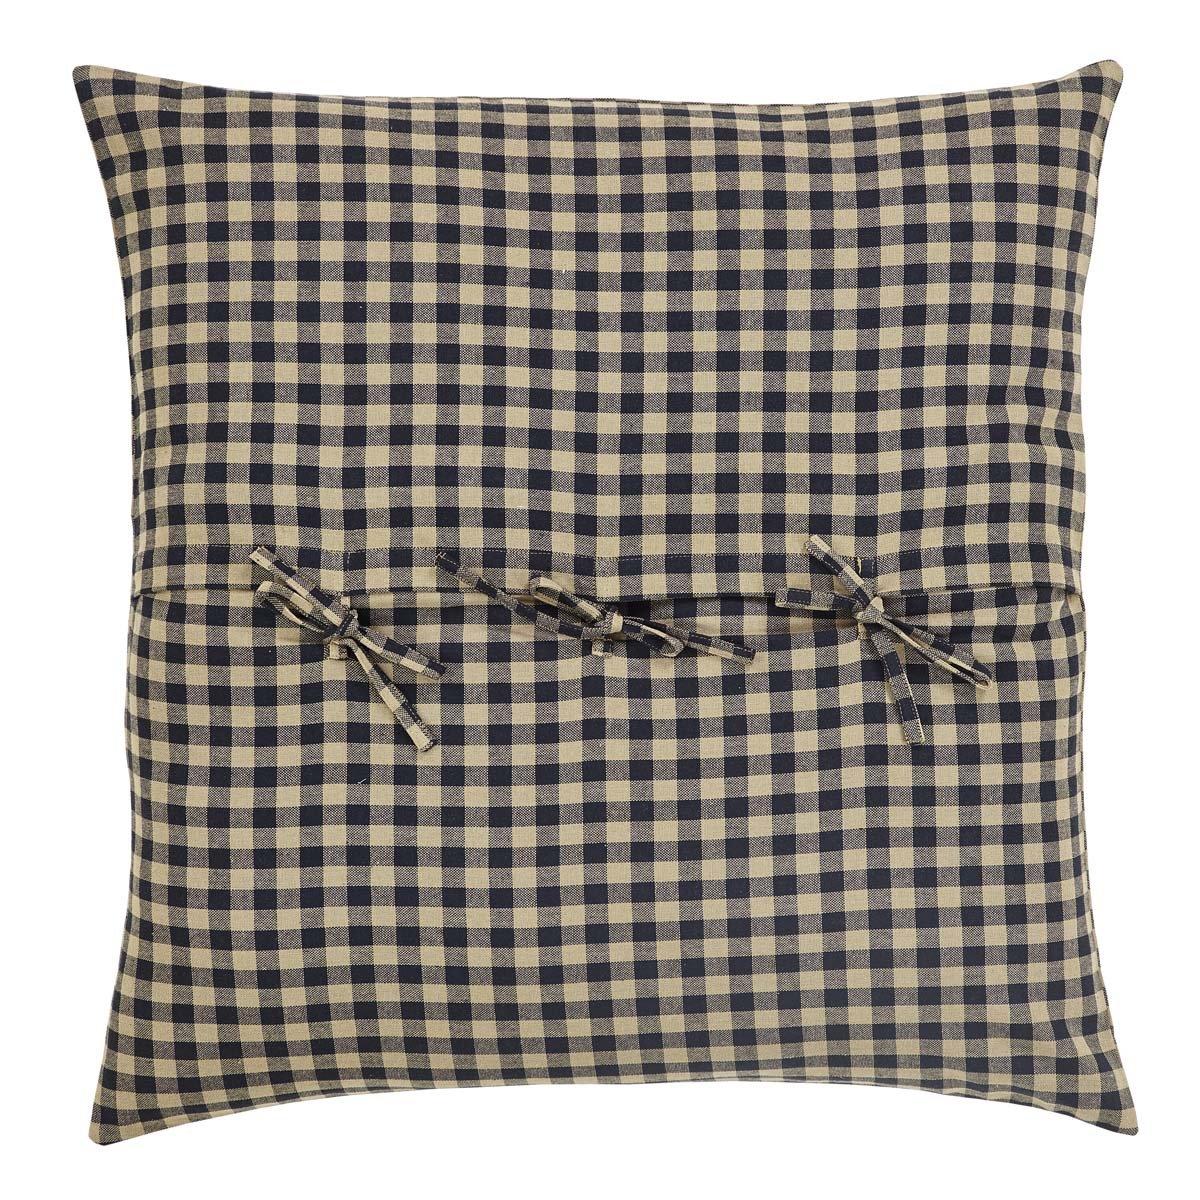 VHC Brands Navy Check Euro Checkered Cotton Sham in Blue